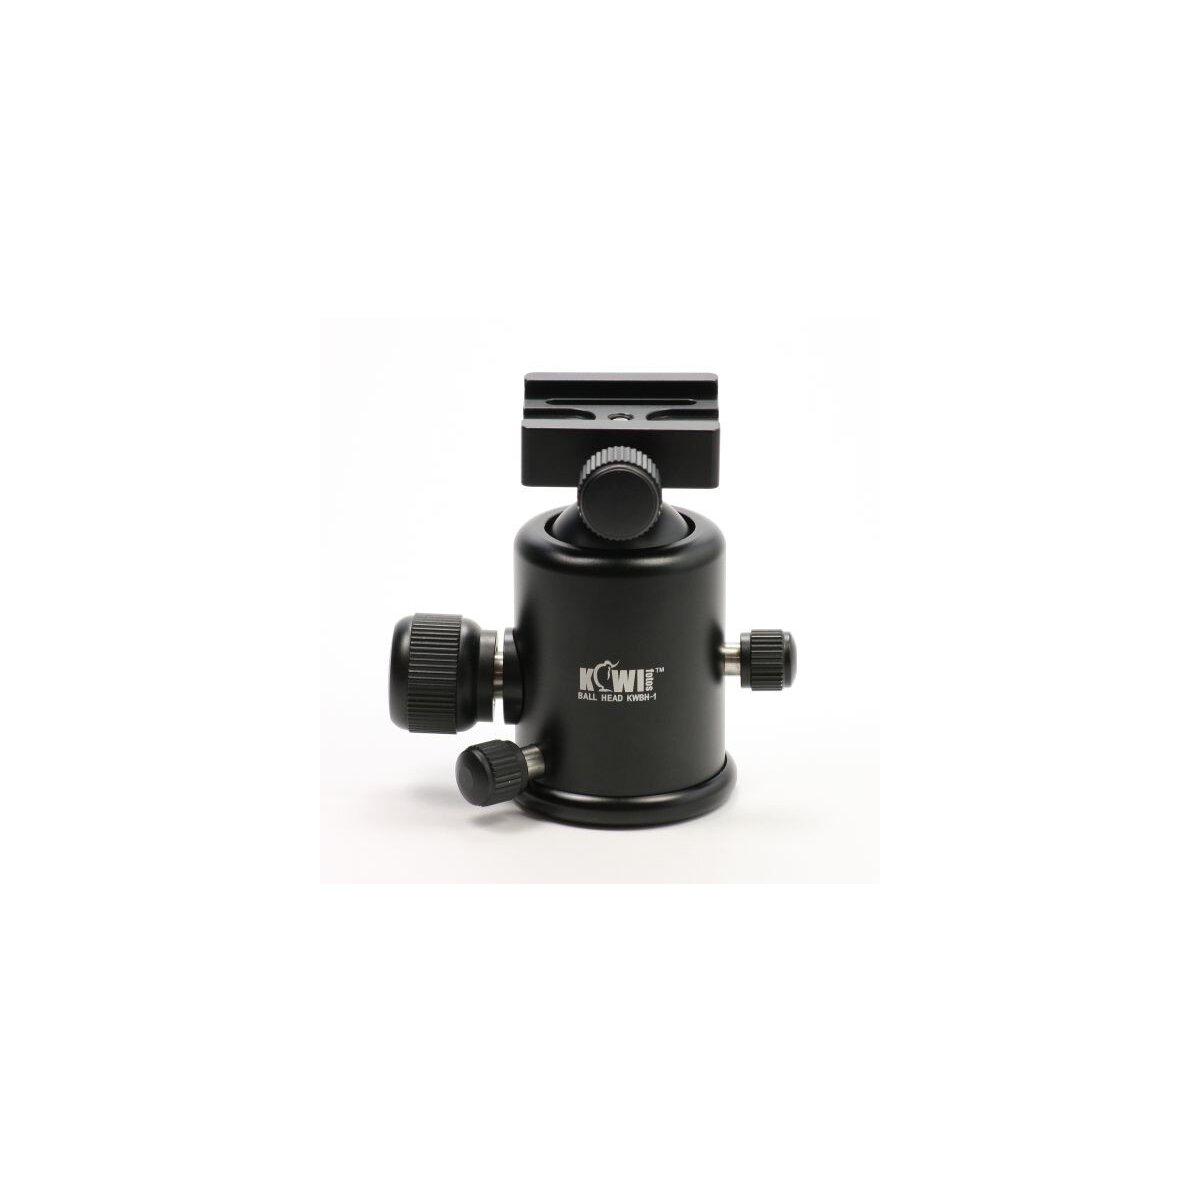 KIWI 3D Kugelkopf (max. 10kg) Stativkopf inkl. Schnellwechselplatte (Arca Swiss kompatibel)